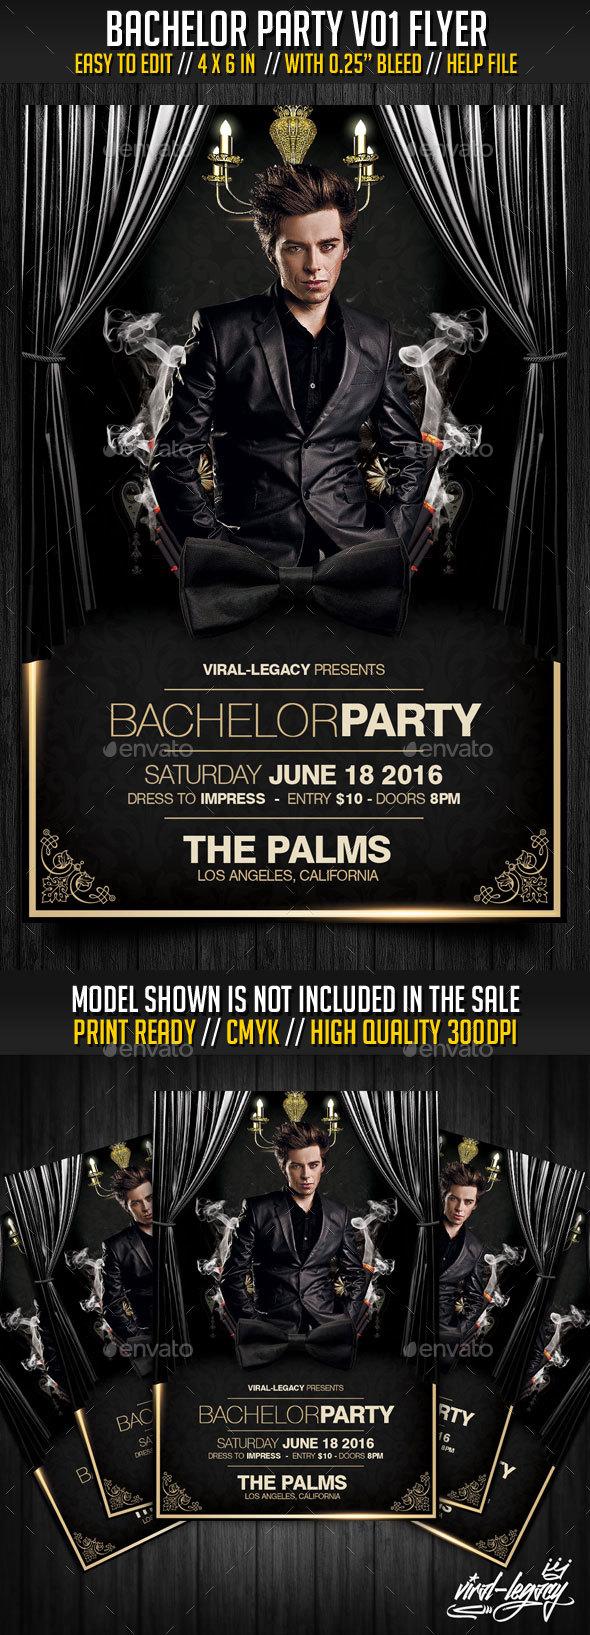 Bachelor Party V01 Flyer - Events Flyers